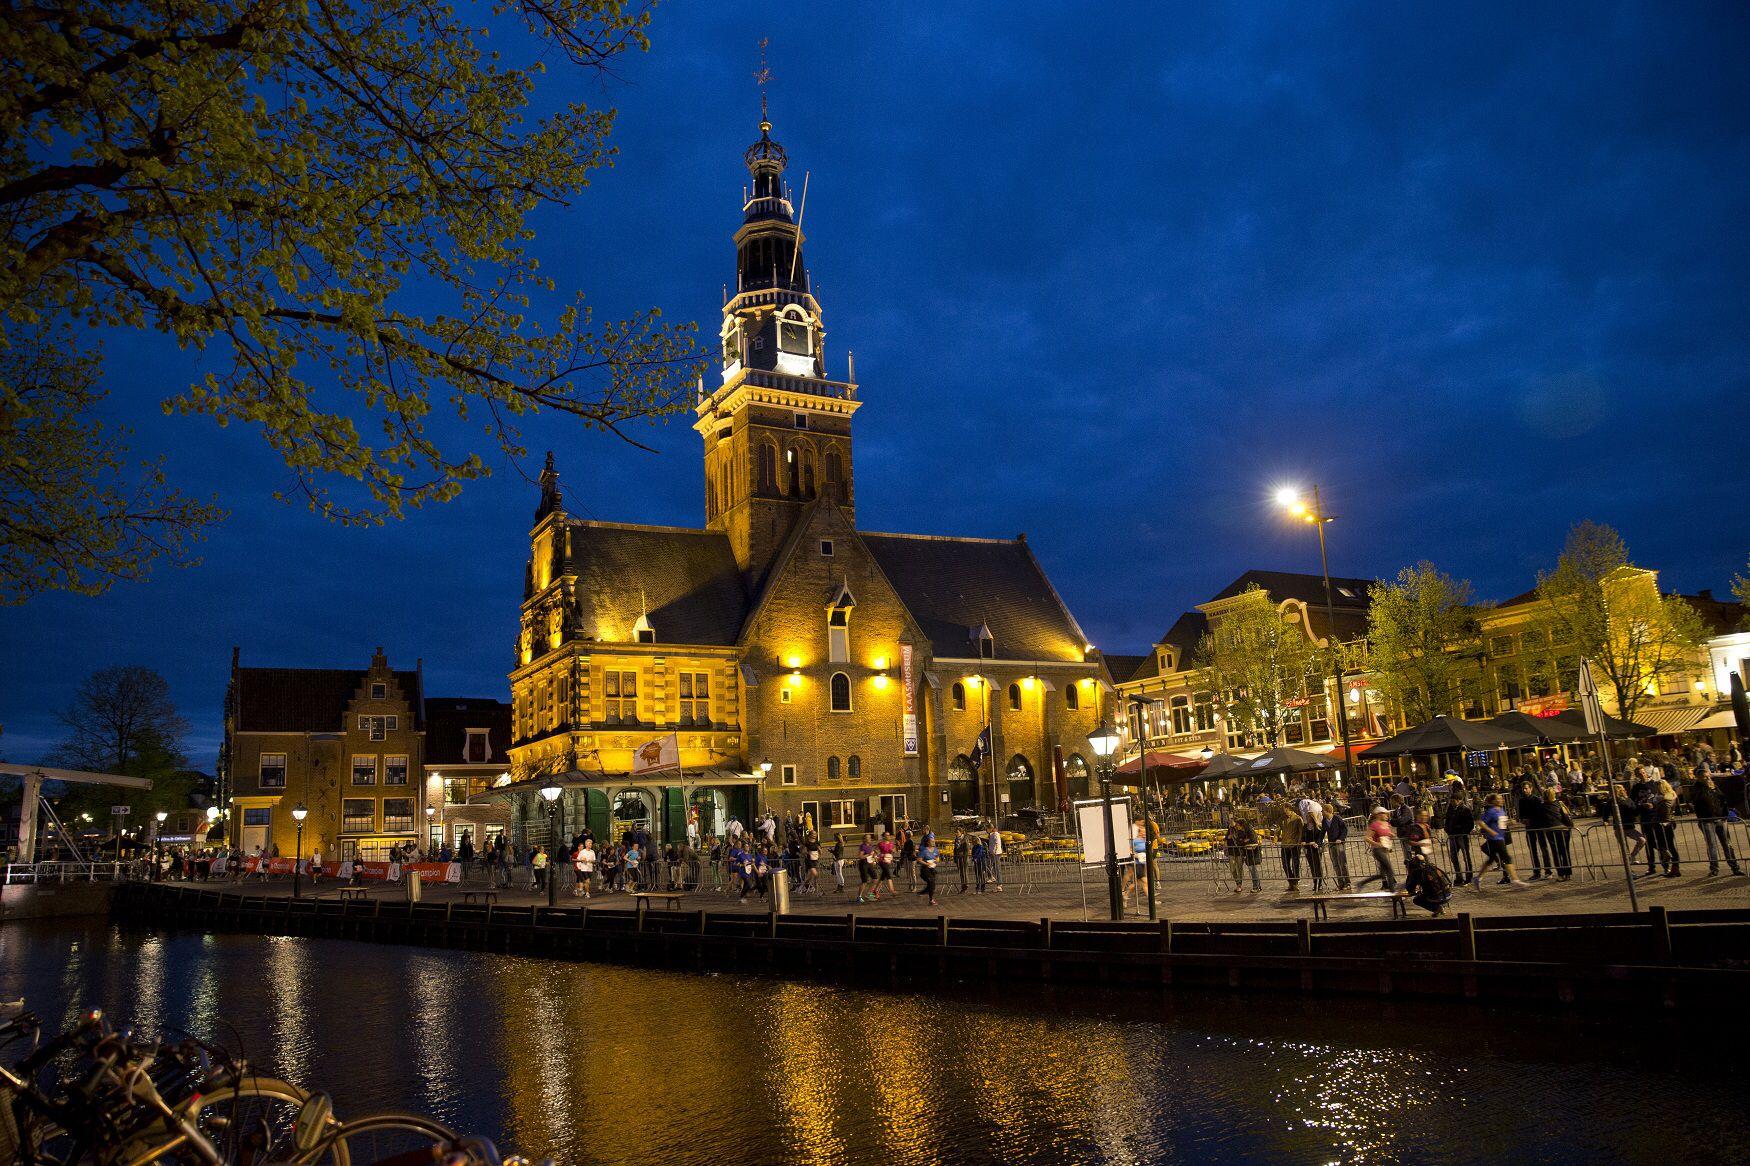 Afbeelding van http://www.runnersfoto.nl/wp/wp-content/uploads/2013/05/Alkmaar-City-Run-by-Night-1.jpg.